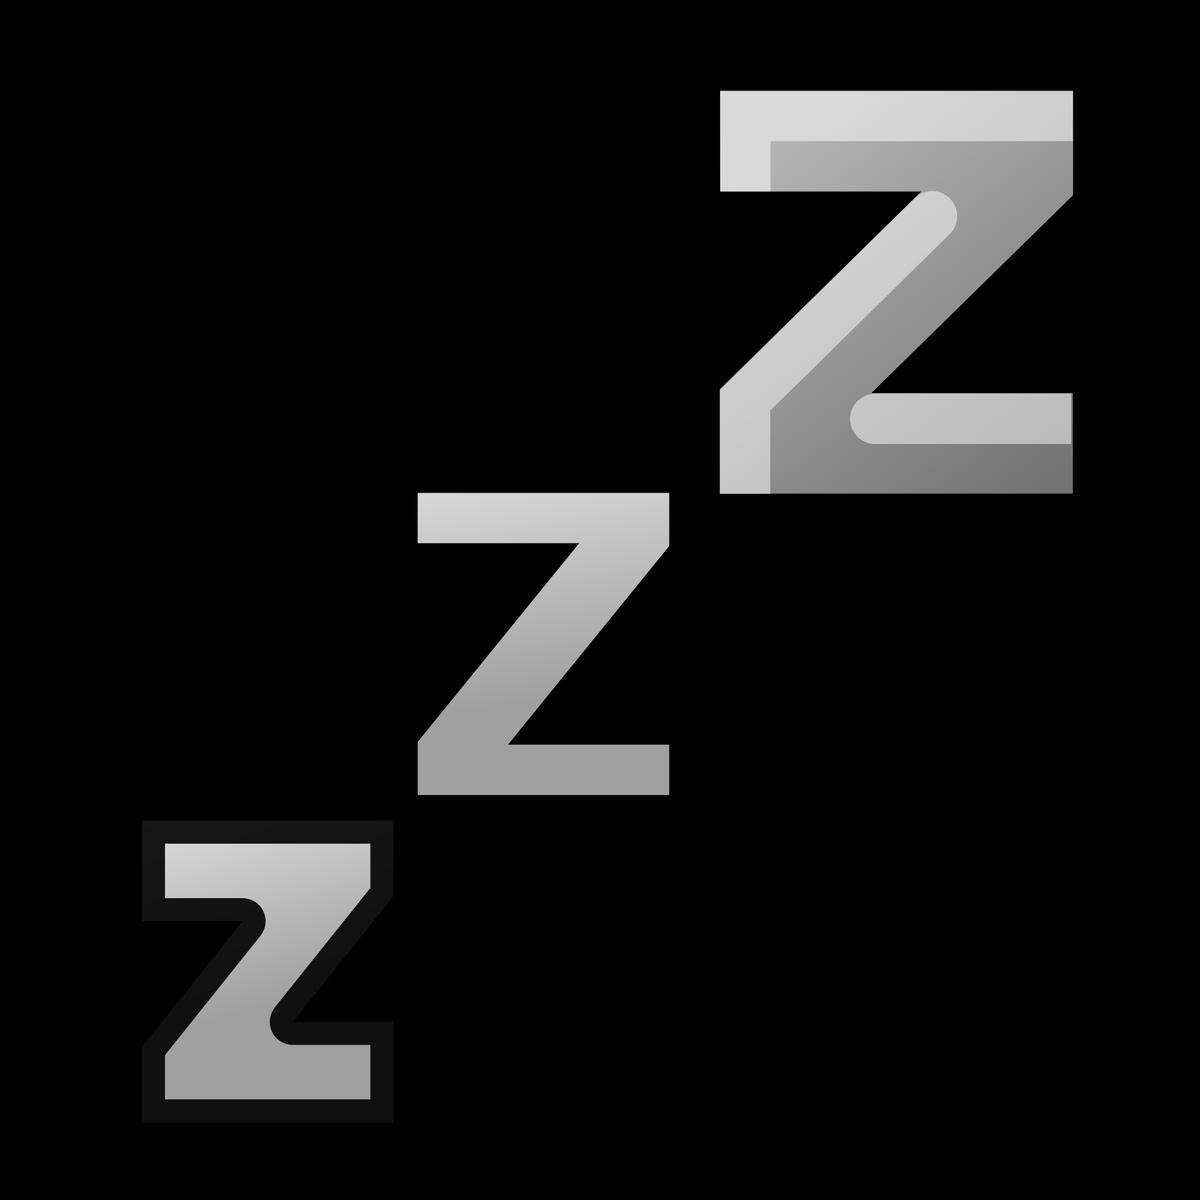 Sleeping clipart zzzz, Sleeping zzzz Transparent FREE for.